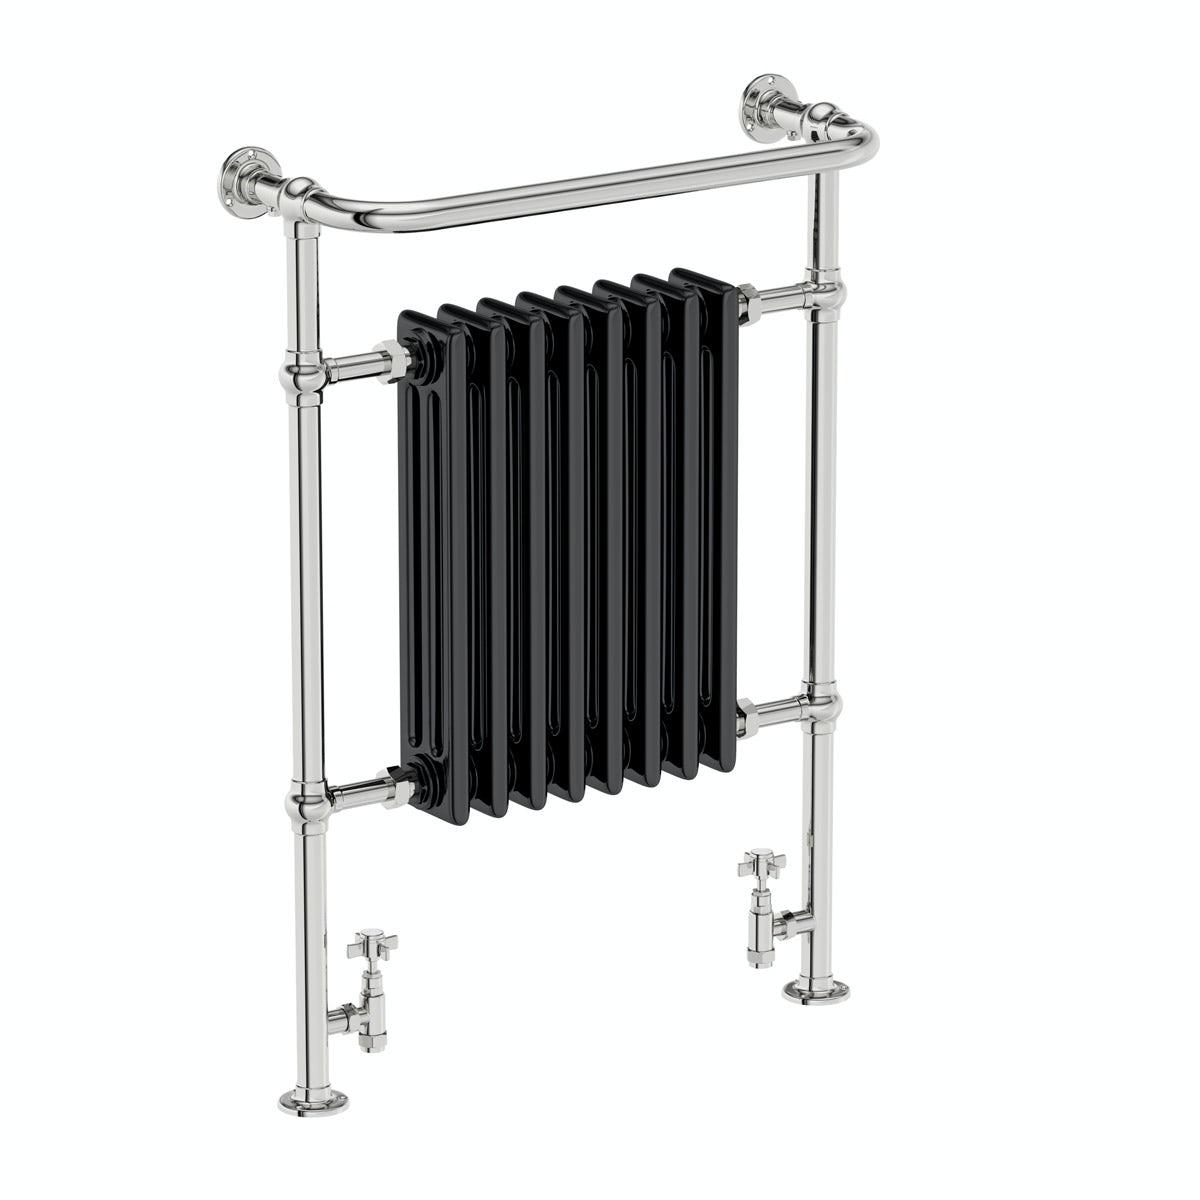 The Bath Co. Dulwich black traditional heated towel rail 952 x 659